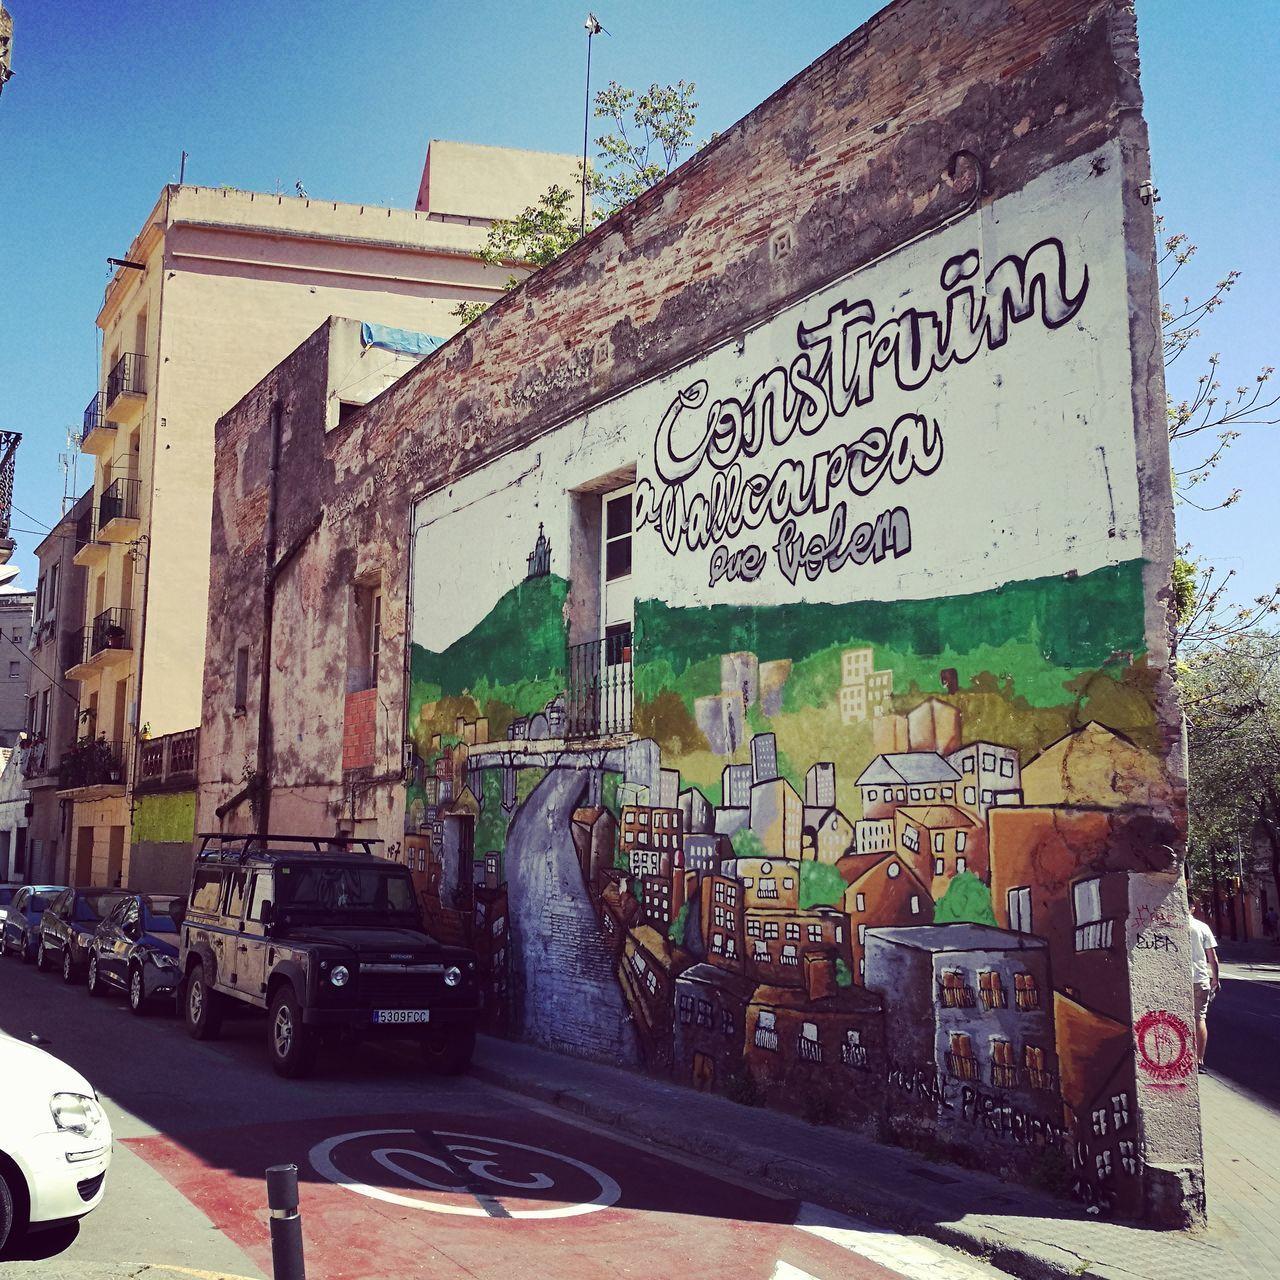 Graffiti Barcelona. Streetphotography Street Art Streetart Graffiti Wall Graffiti Graffiti & Streetart Graffiti Art Graffiti The World Graffiti Photography Graffitiworldwide